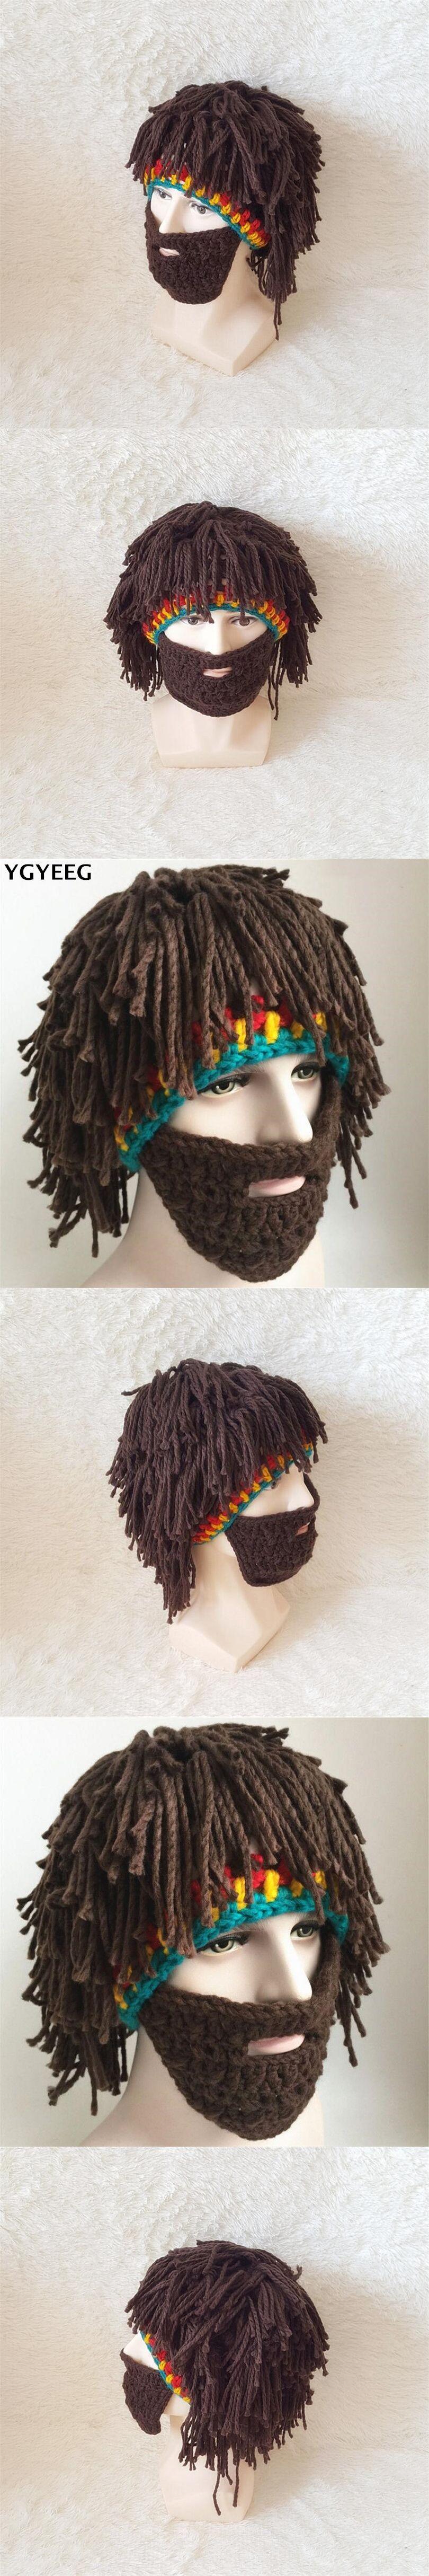 fd8817f3a33 YGYEEG Wig Beard Hats Hobo Mad Scientist Caveman Handmade Knit Warm Winter  Caps Men Women Halloween